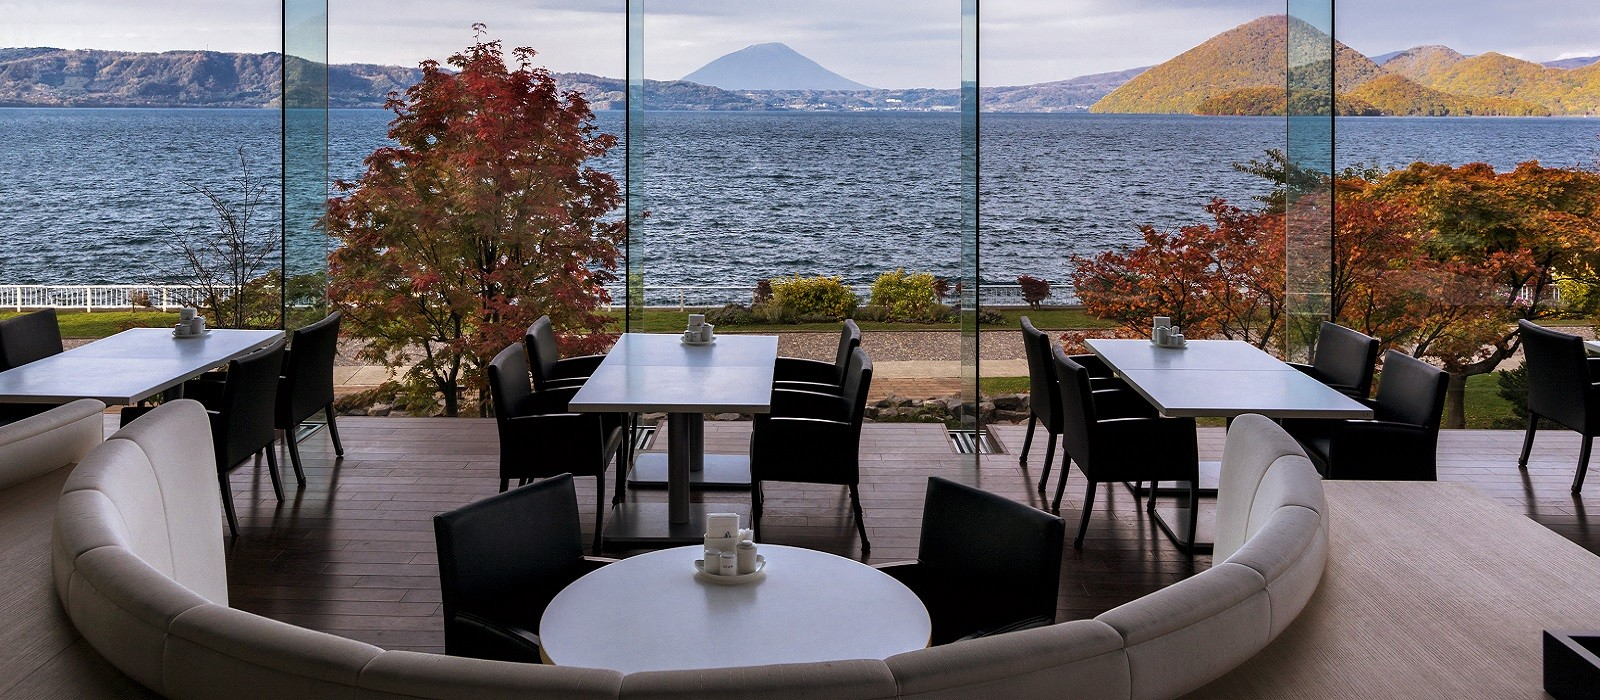 Hotel The Lake View Toya Nonokaze Resort Japan